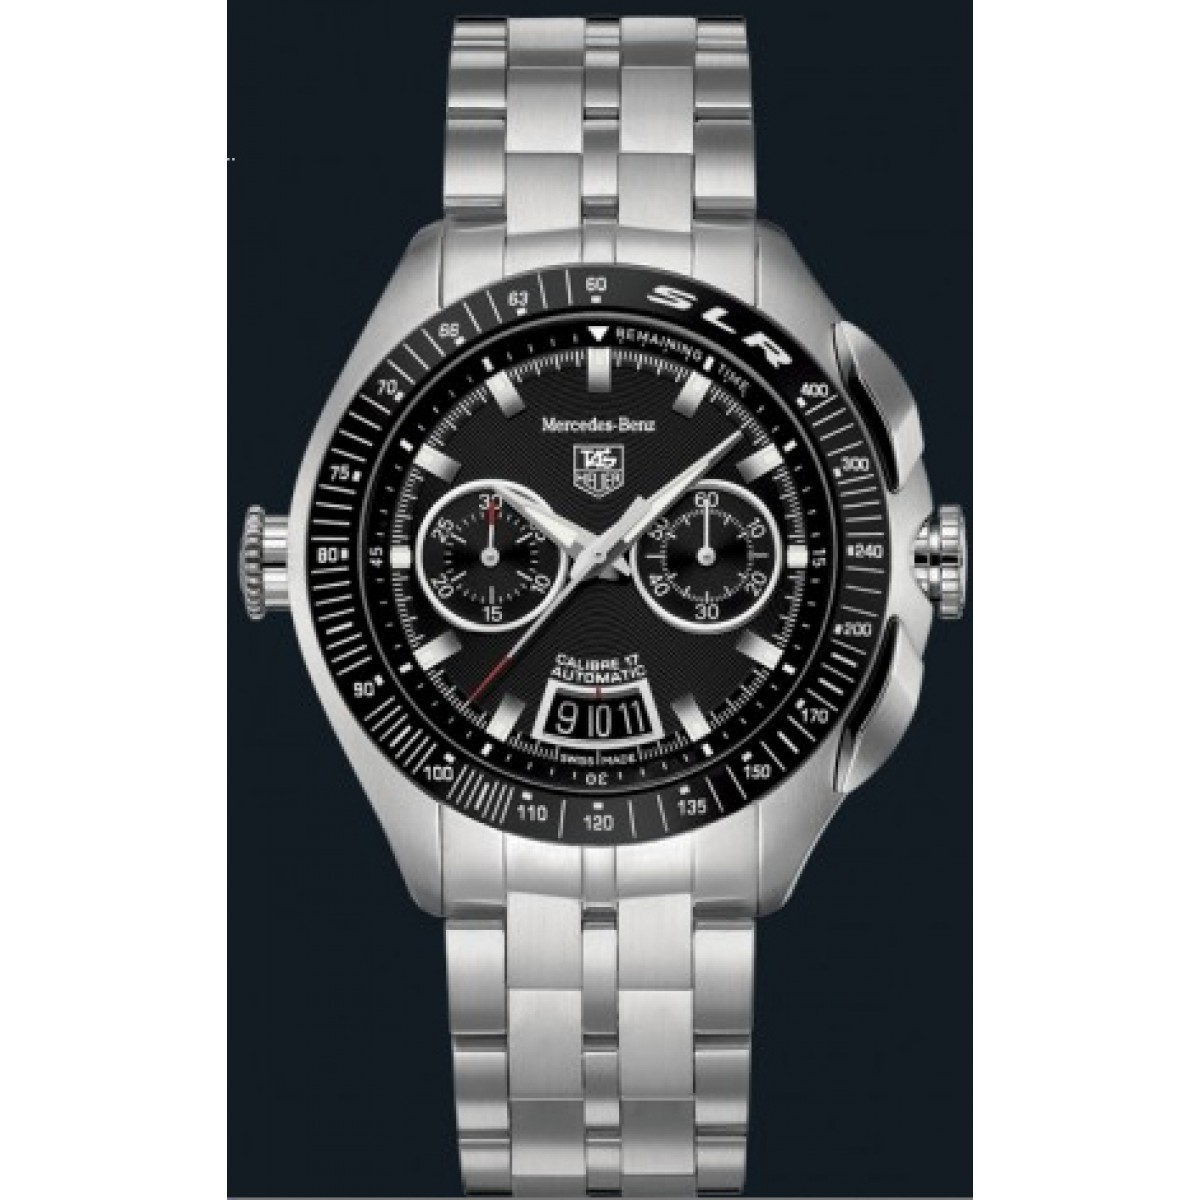 cb1f5f51b06 Relógio Réplica Tag Heuer Mercedes Benz SLR 01